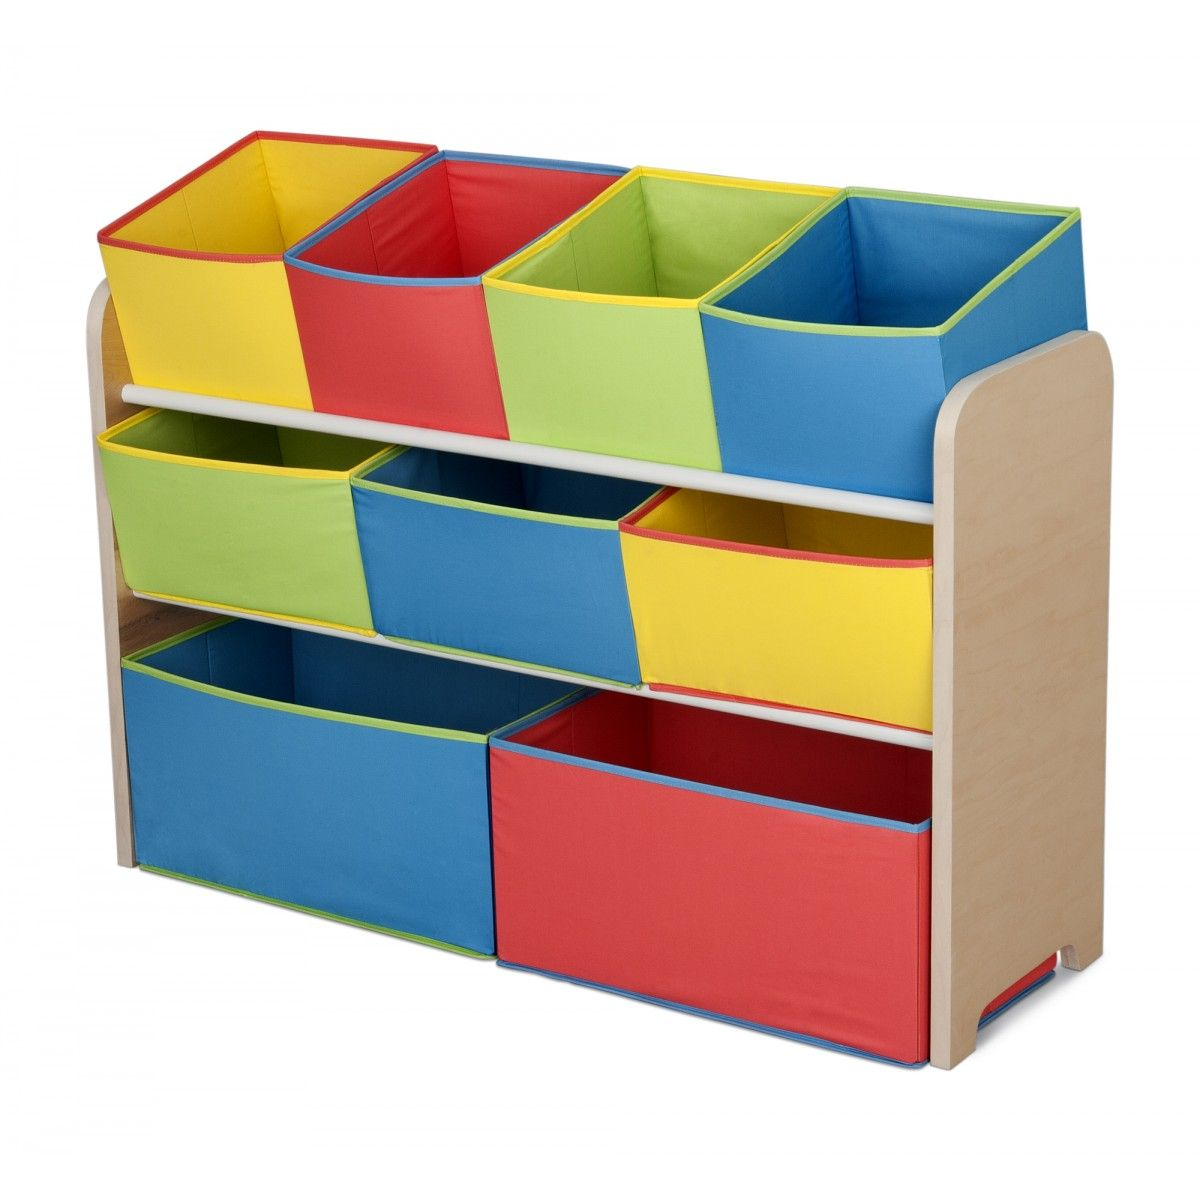 Wonderful Multi Bin Toy Organizer | Delta Multi Color Toy Organizer With Storage Bins